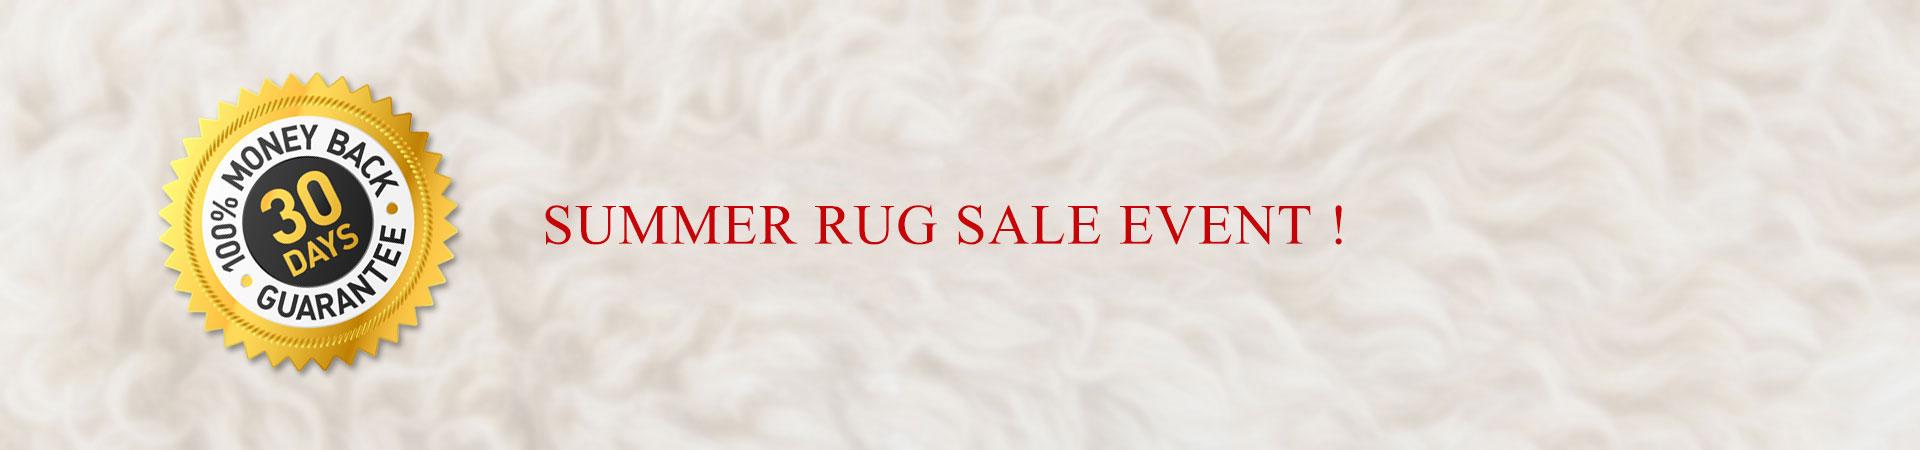 Summer Rug Sale Event !